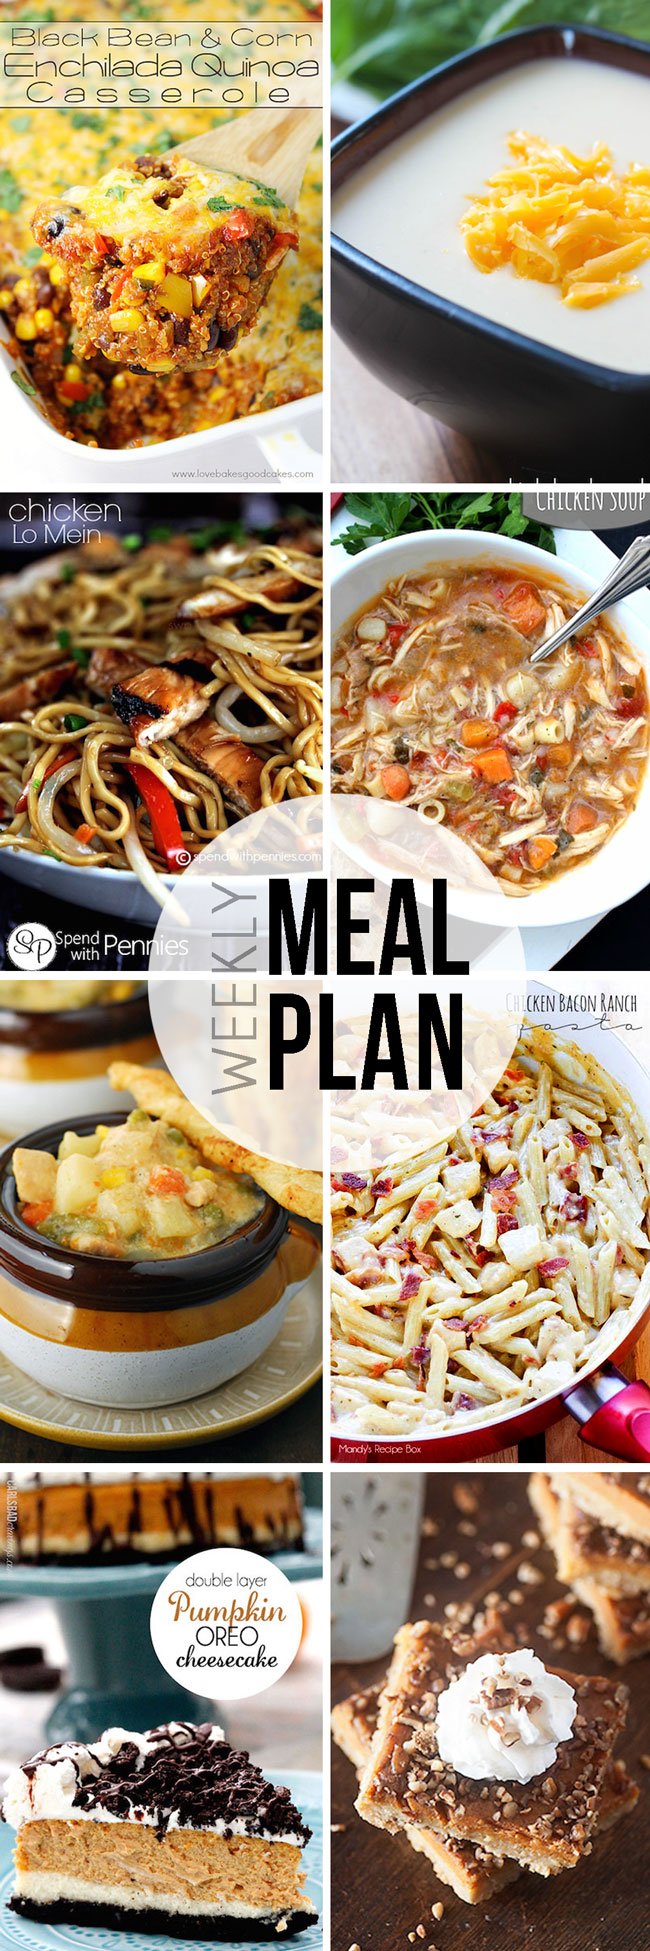 Meal-Plan---Pinterest-14